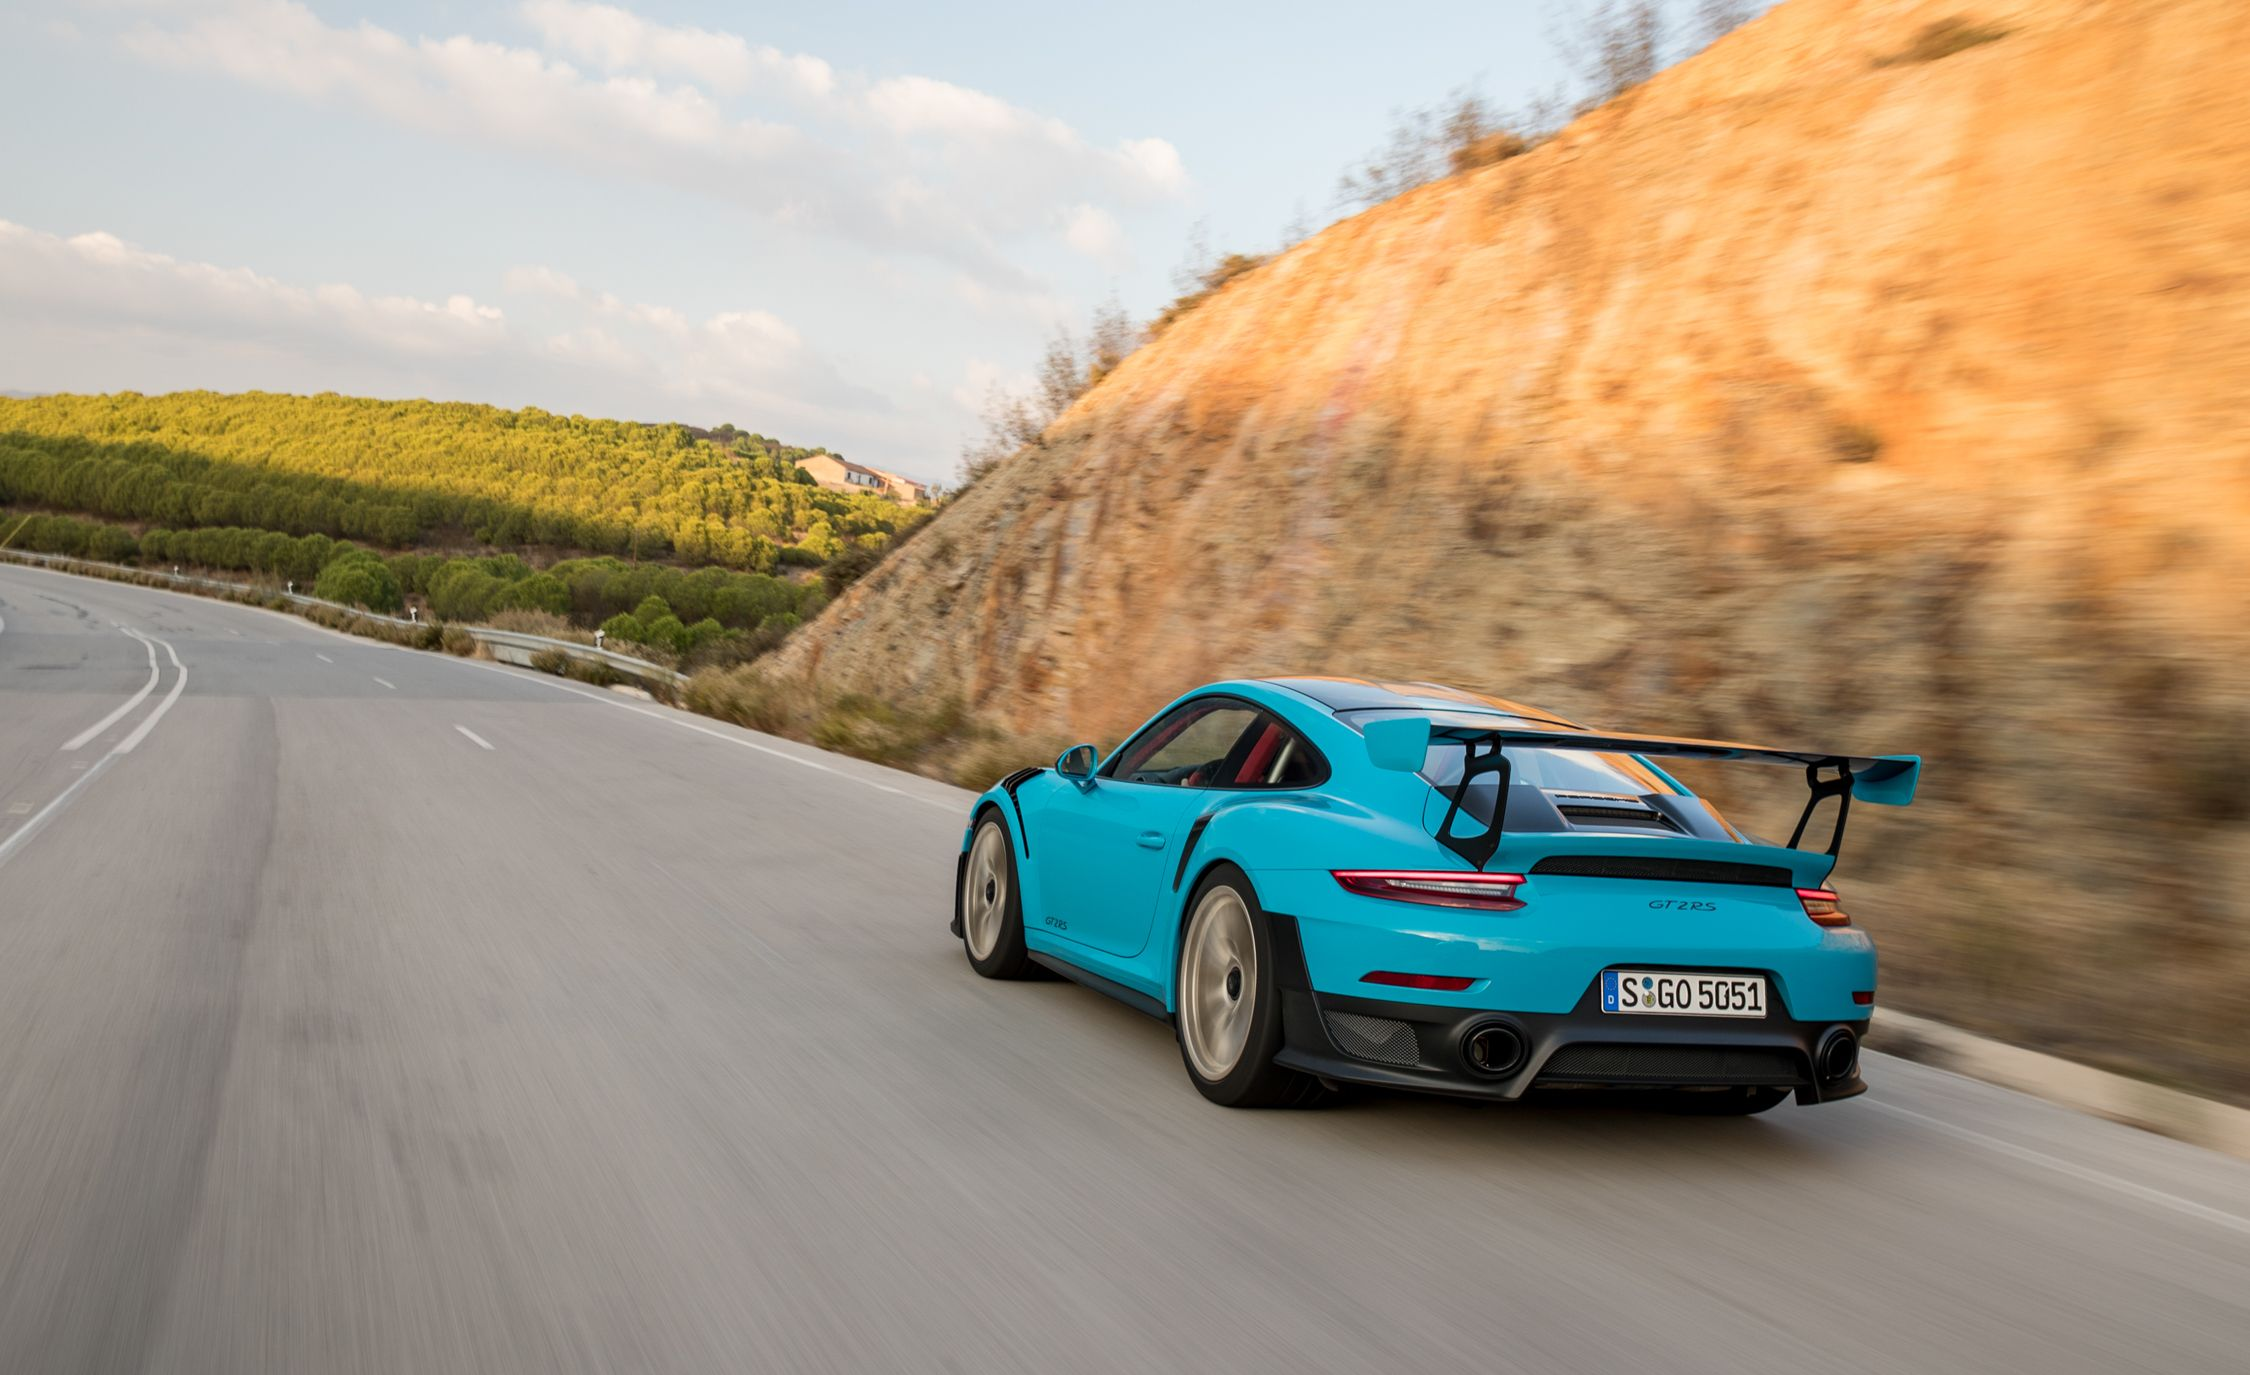 2019 Porsche 911 Gt2 Rs Reviews Price Photos And Specs Car Driver